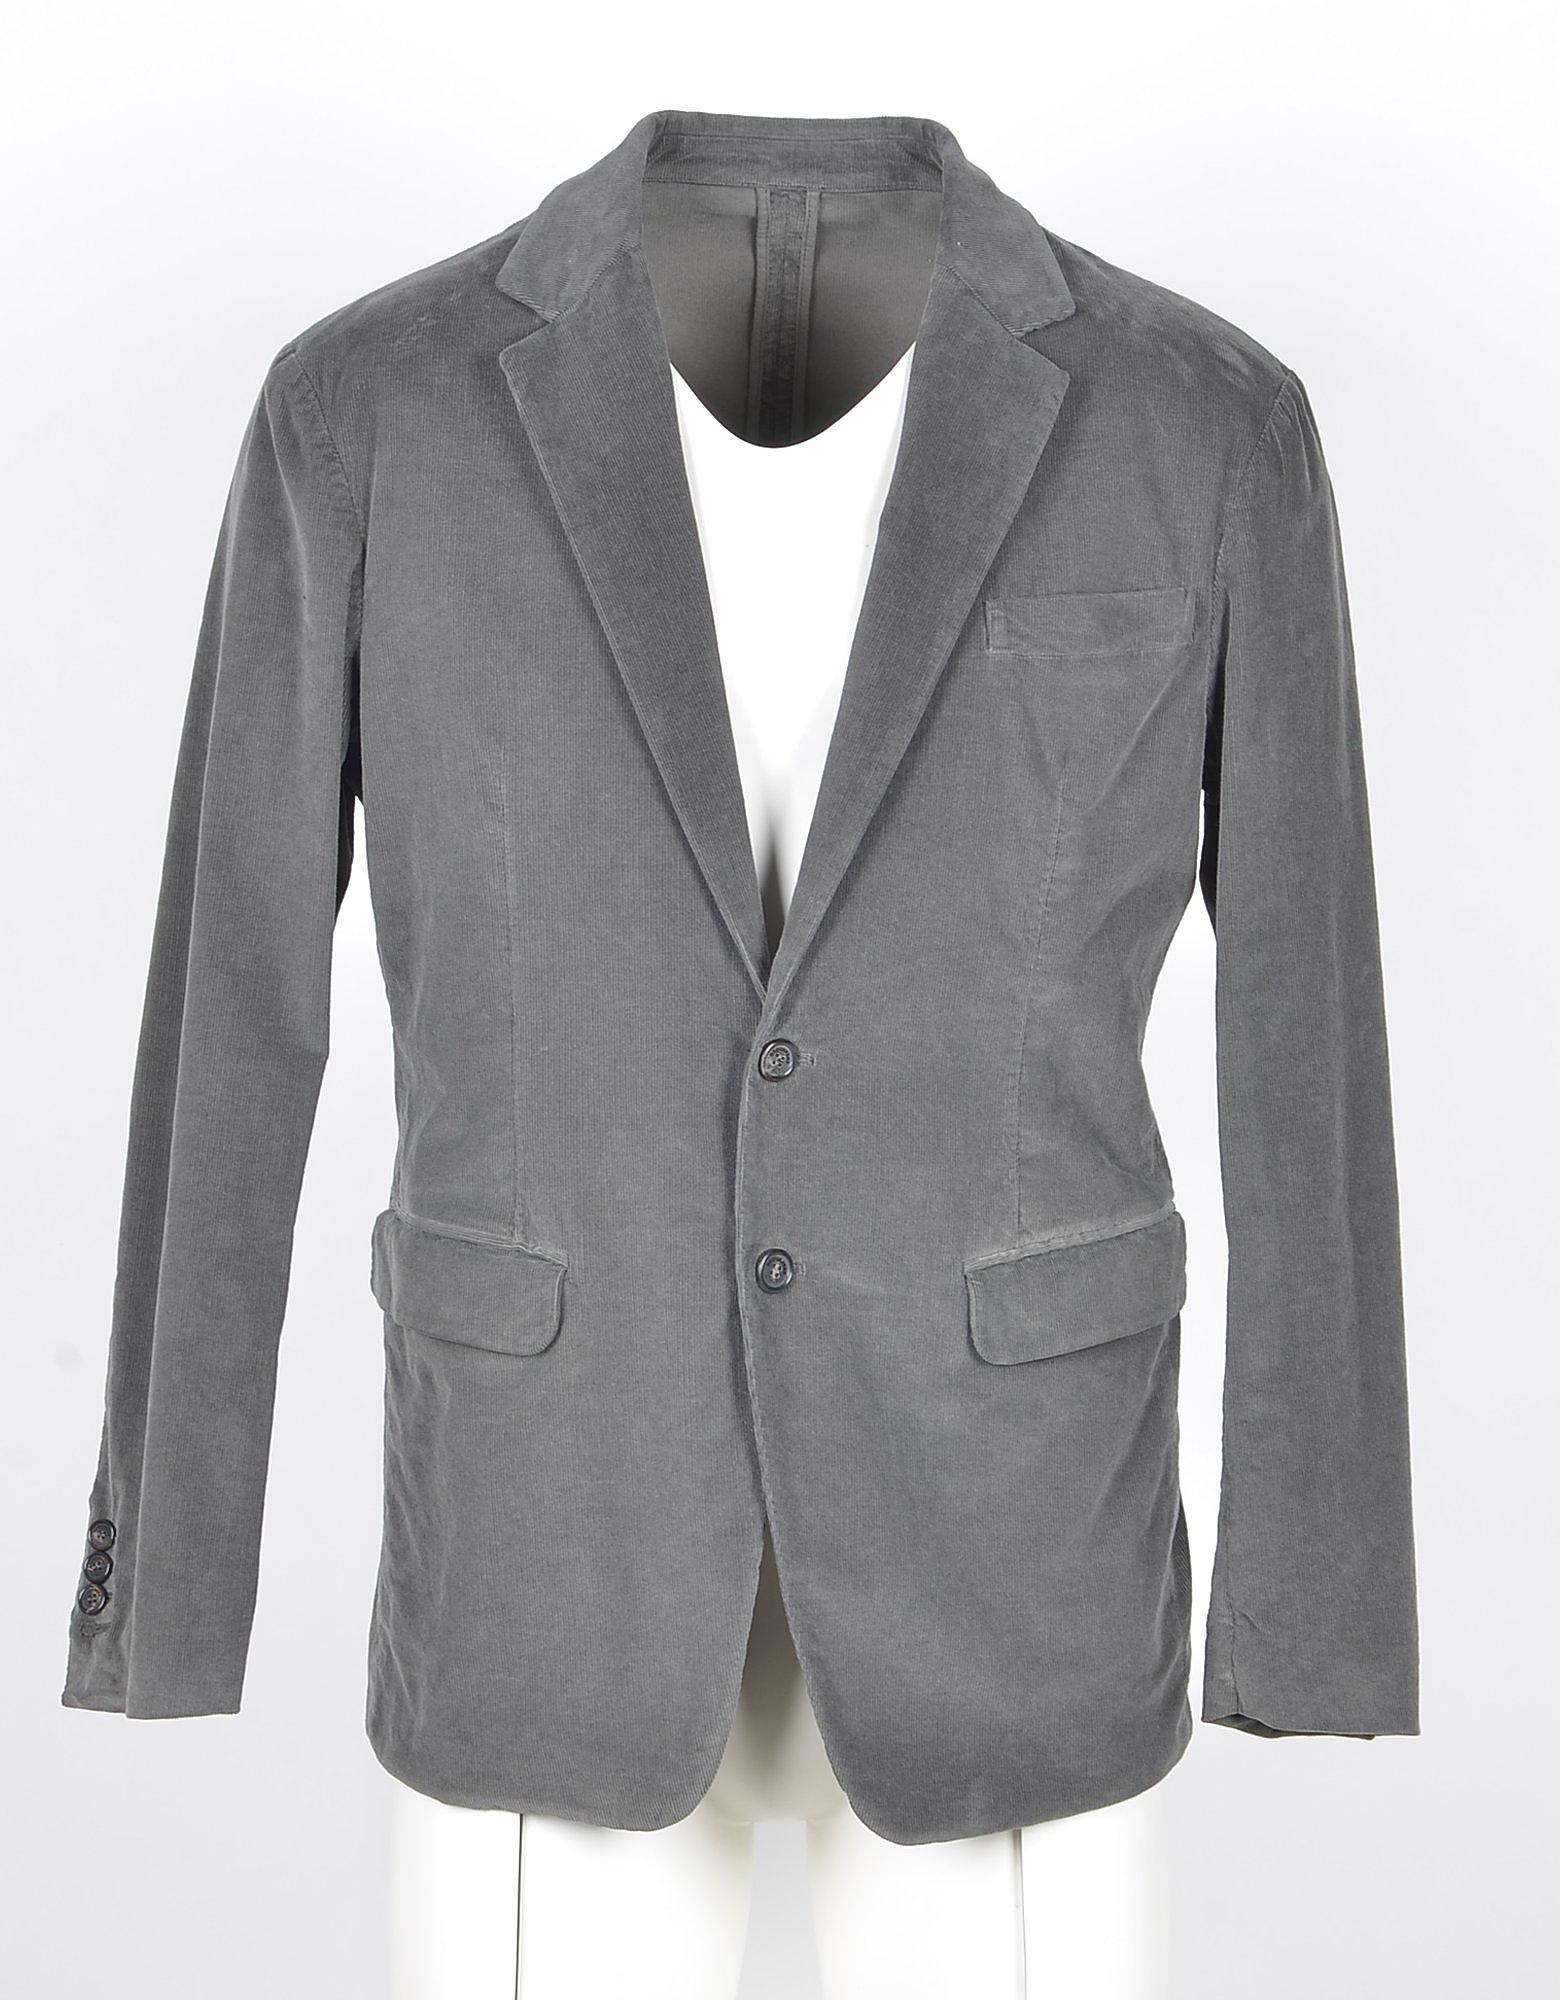 DSquared2 Designer Coats & Jackets, Men's Gray Blazer